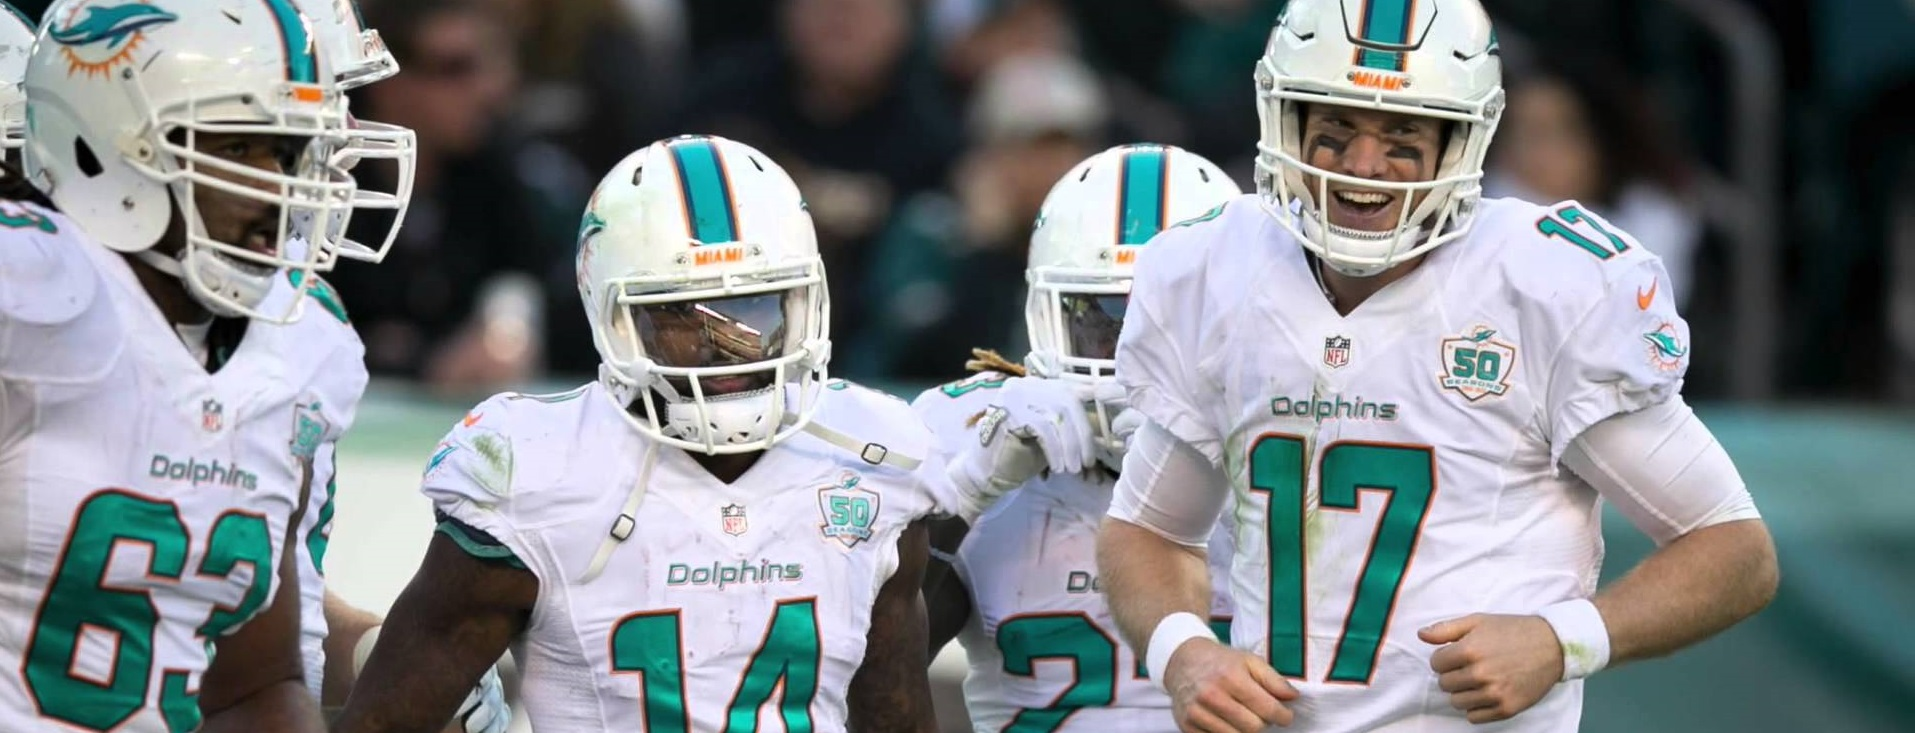 Happy Tanny + Jarvisjewishknight51Parker +TanneNFL: Miami Dolphins at Washington RedskinsKinny